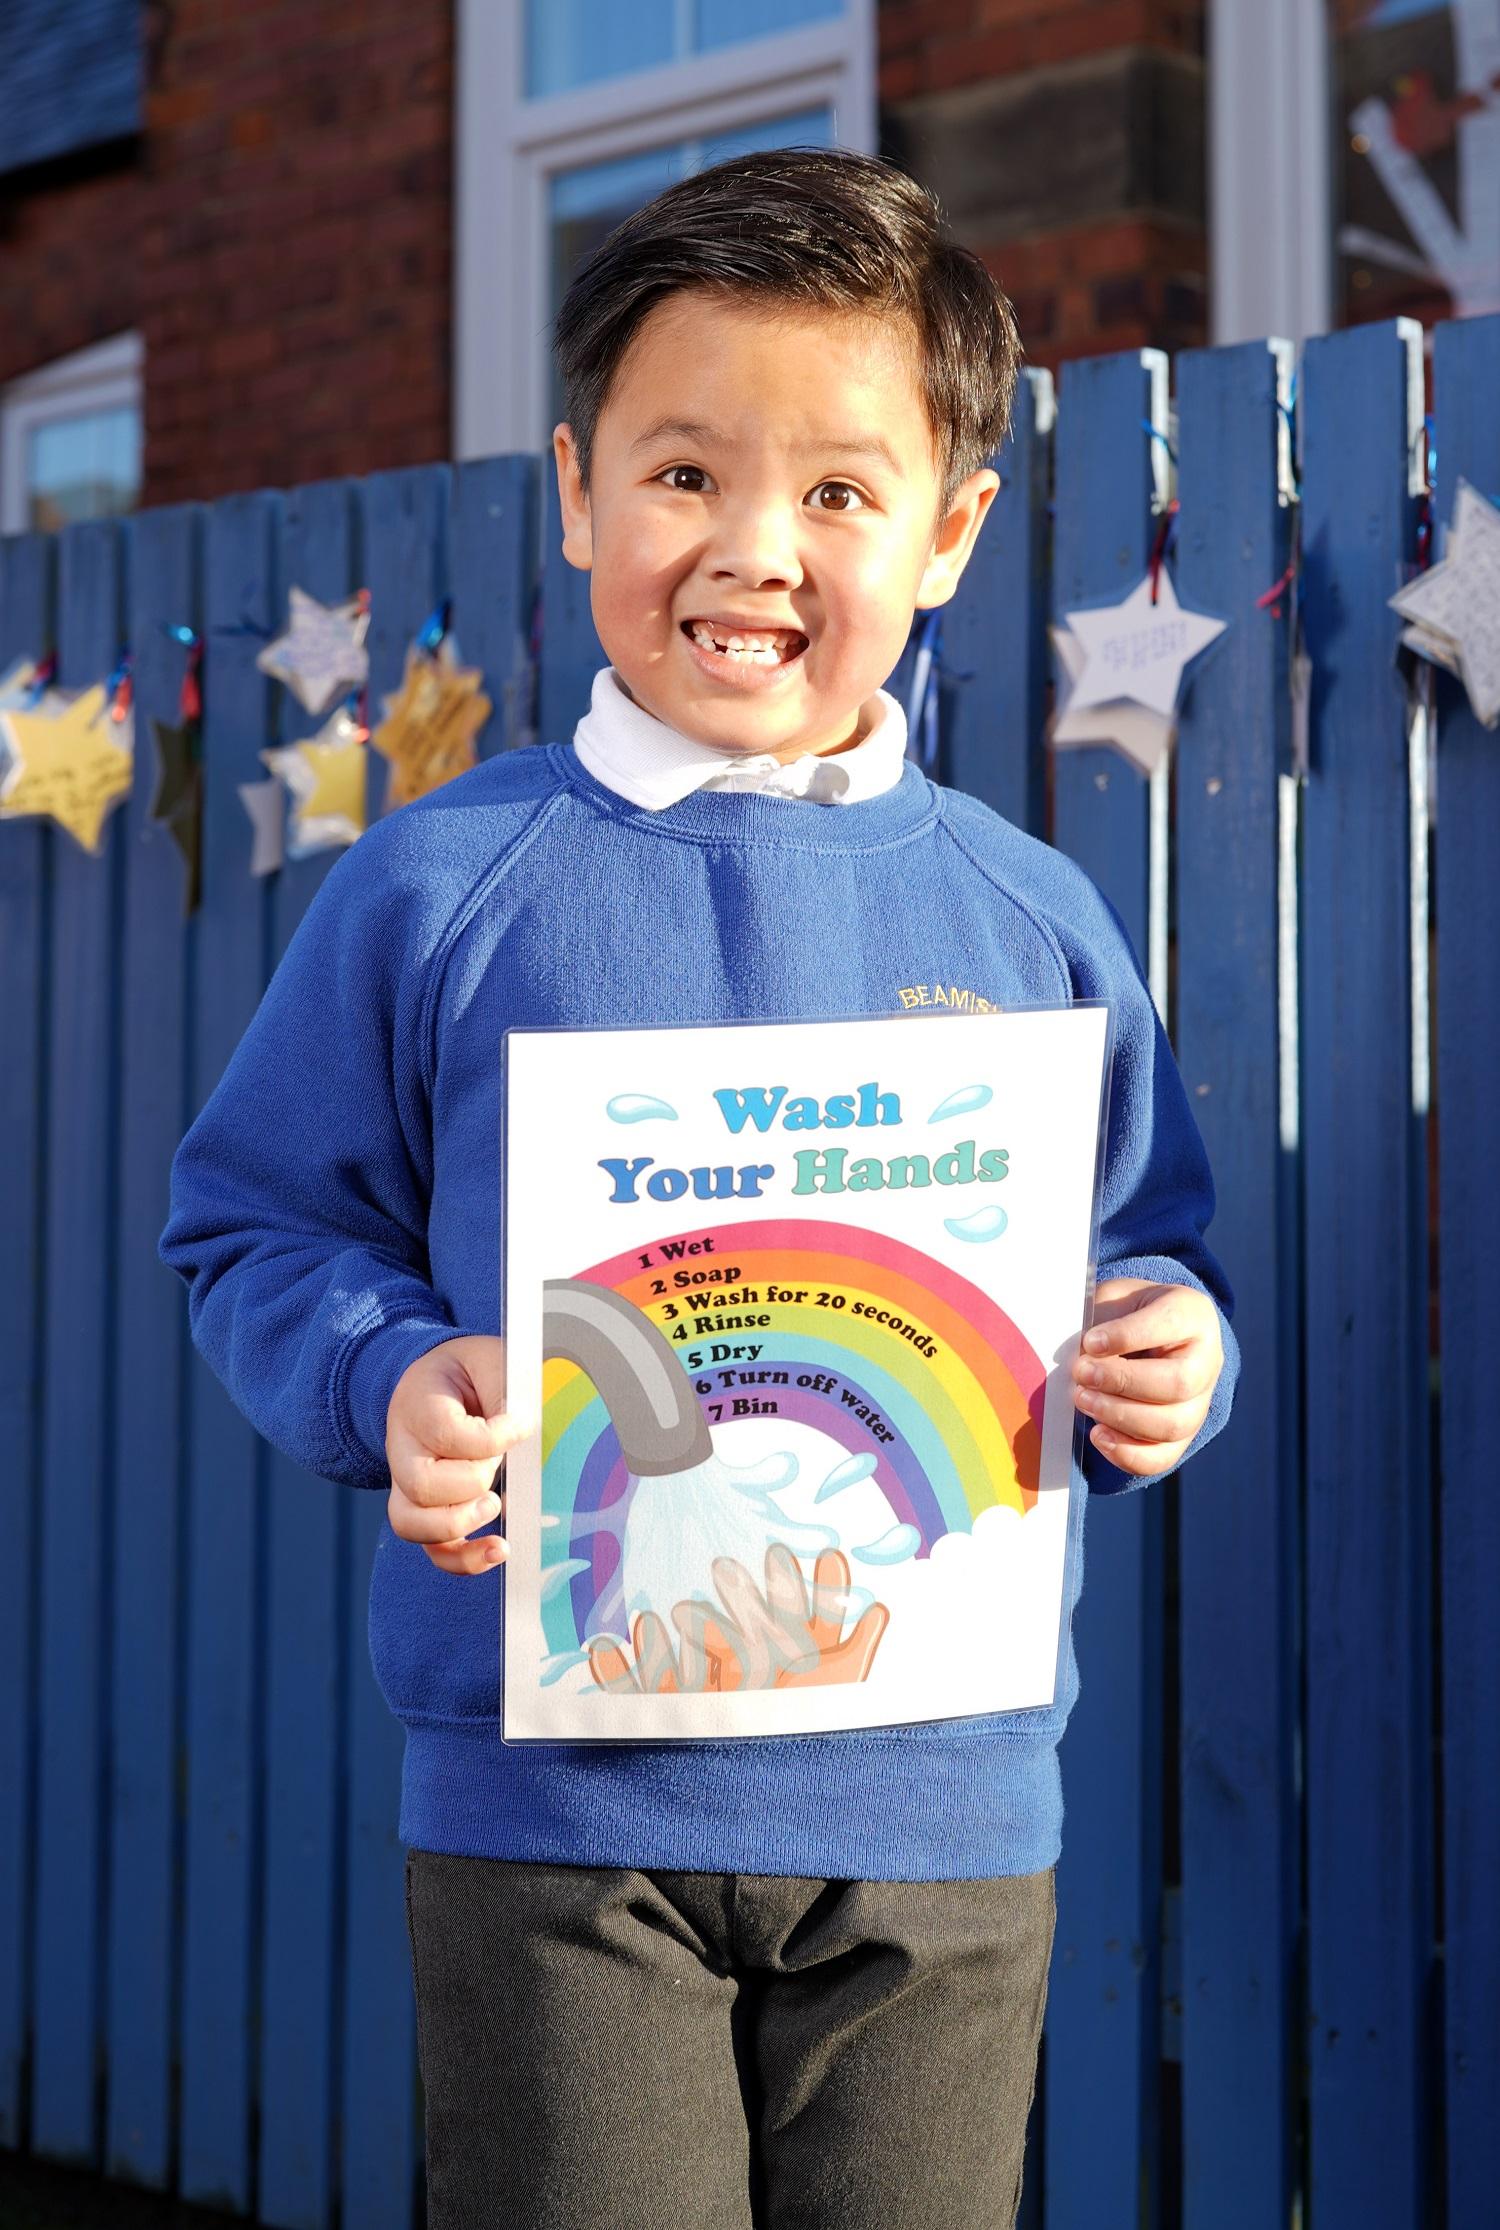 County Durham Schoolchildren Get Creative With Covid-19 Caution Poster Designs